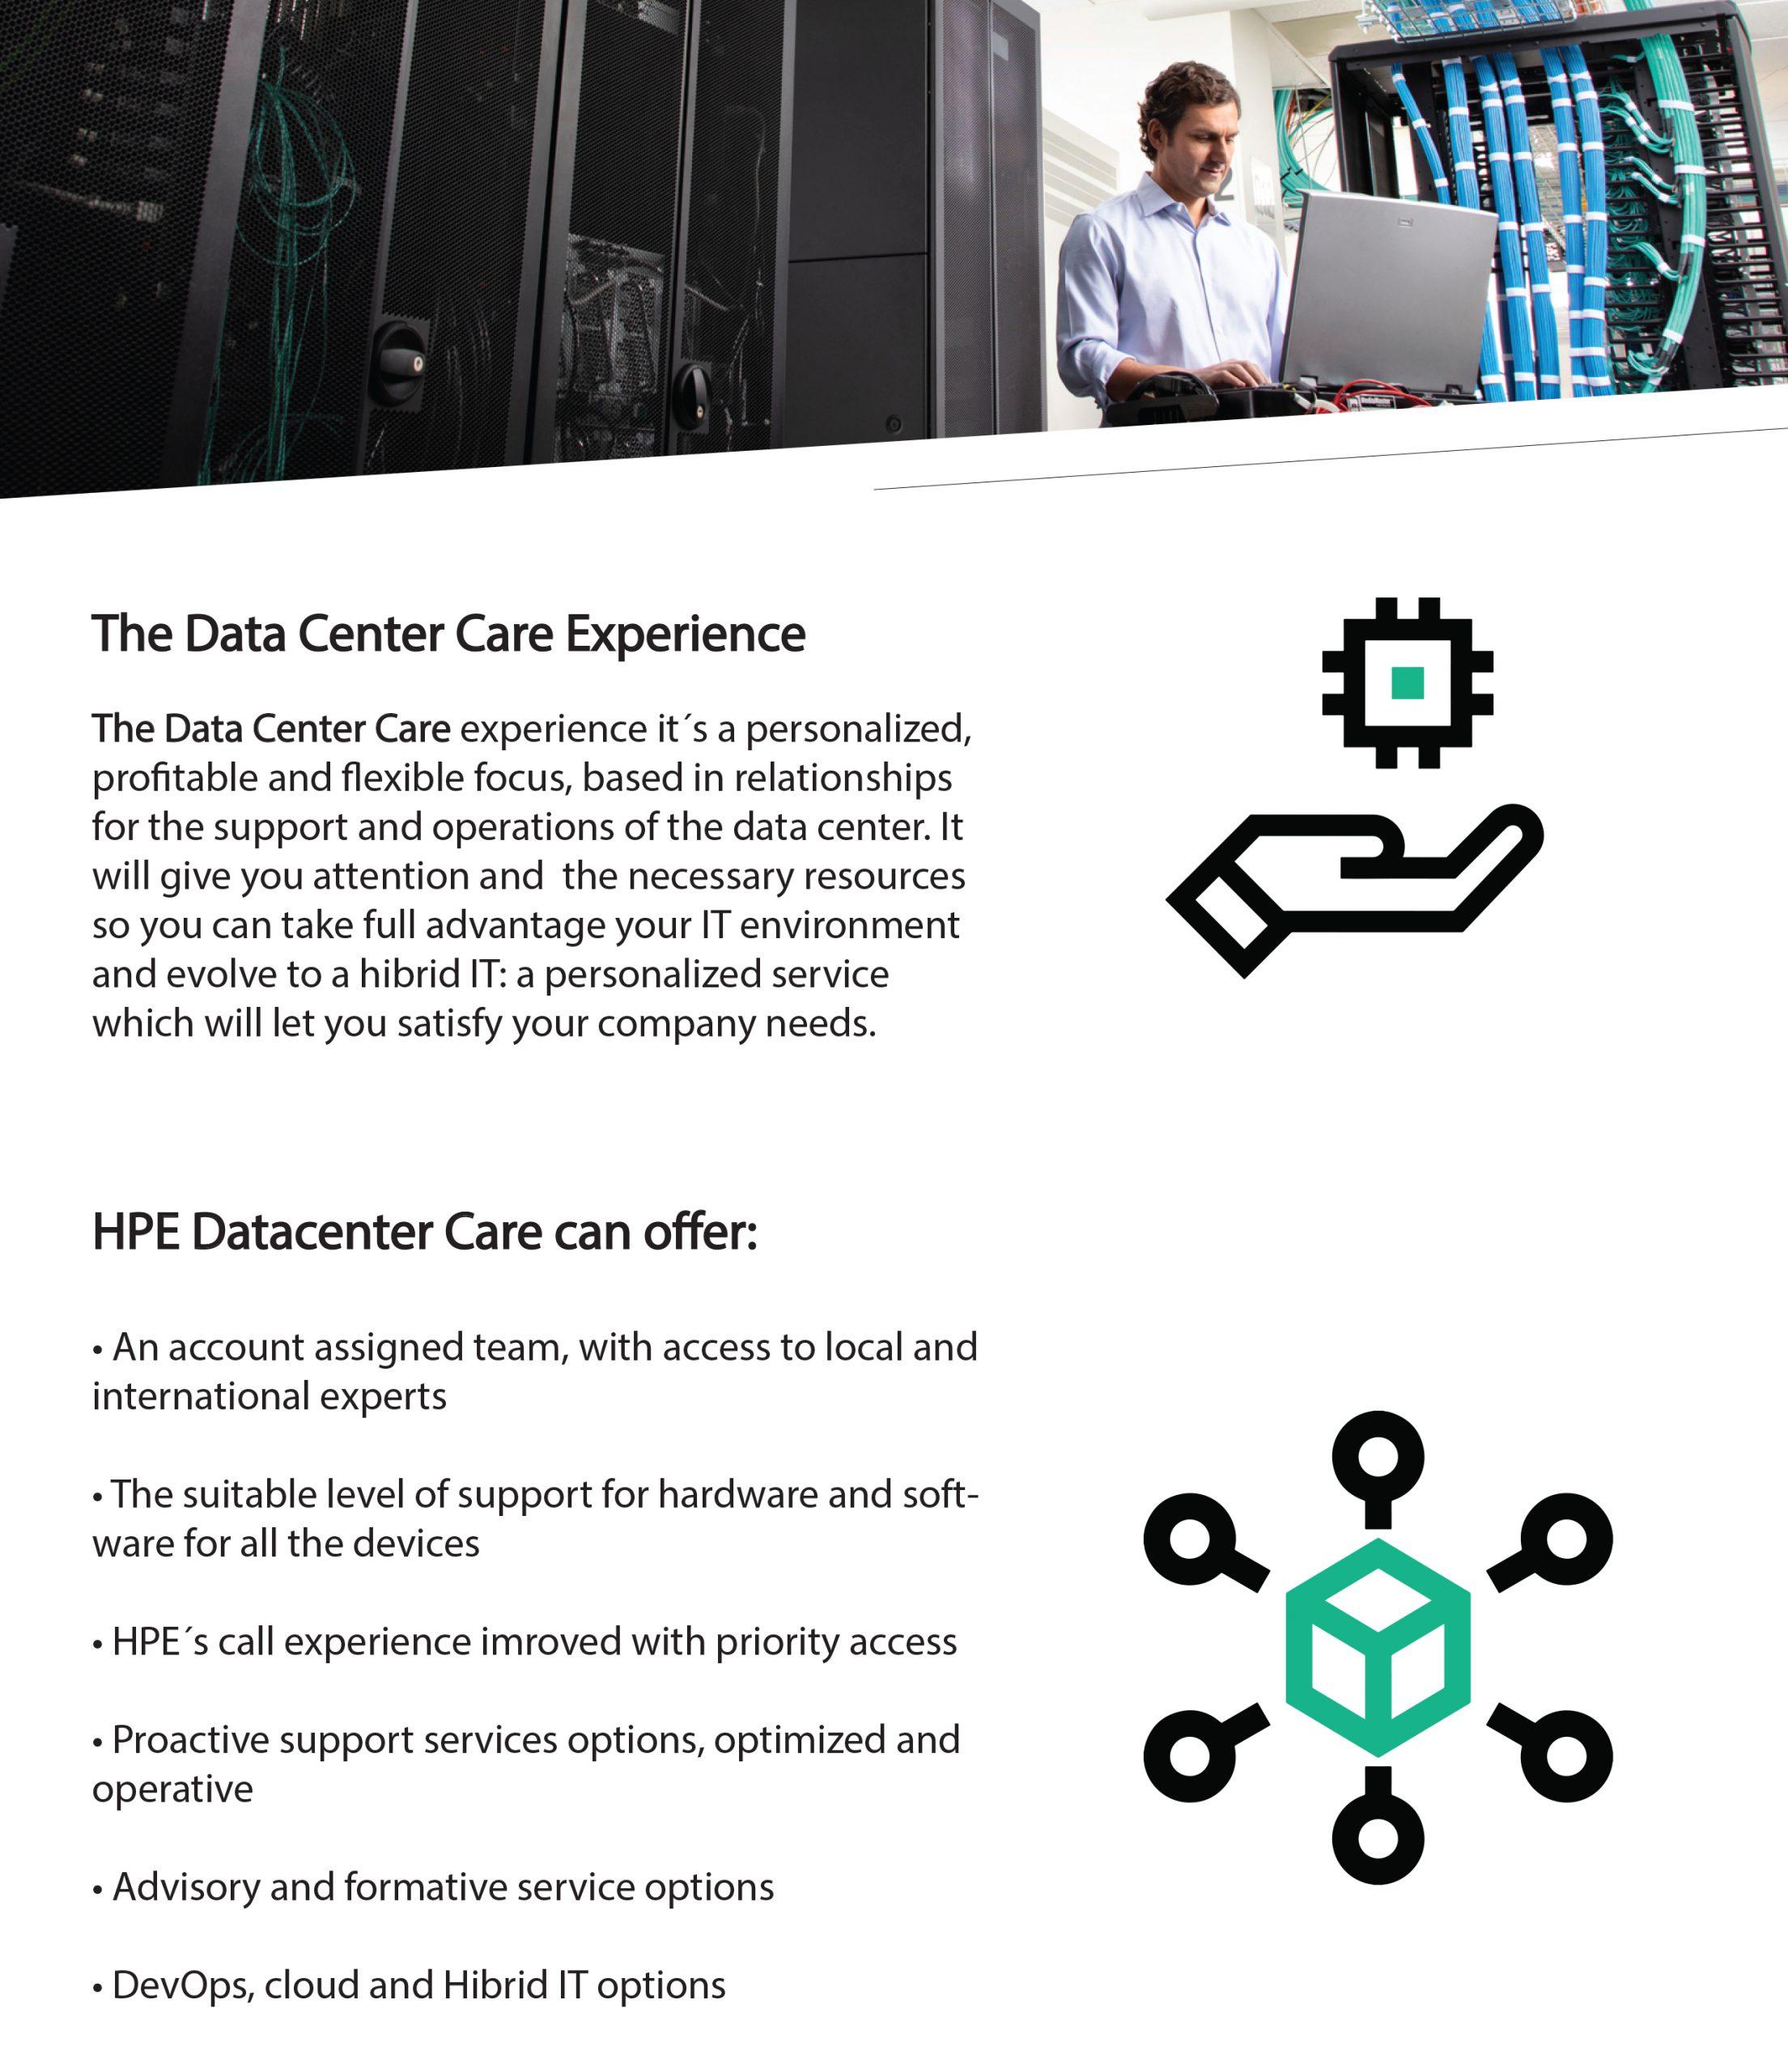 HPE DC Care